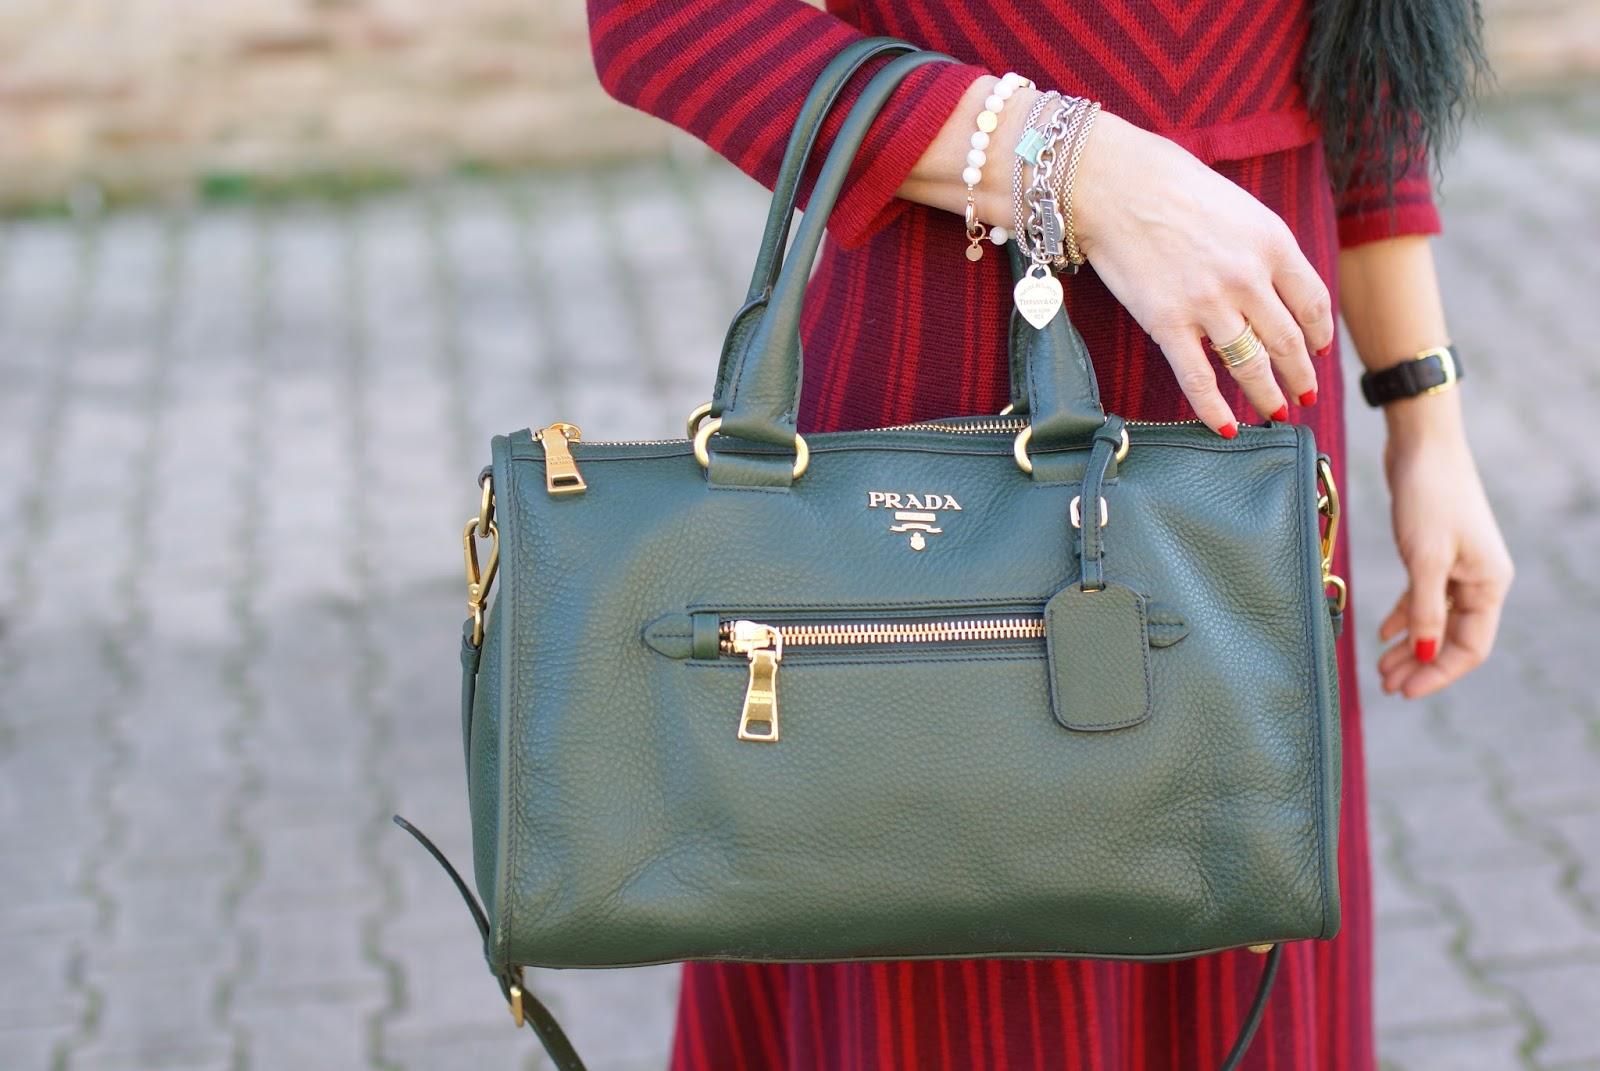 Prada boston bag on Fashion and Cookies fashion blog, fashion blogger style